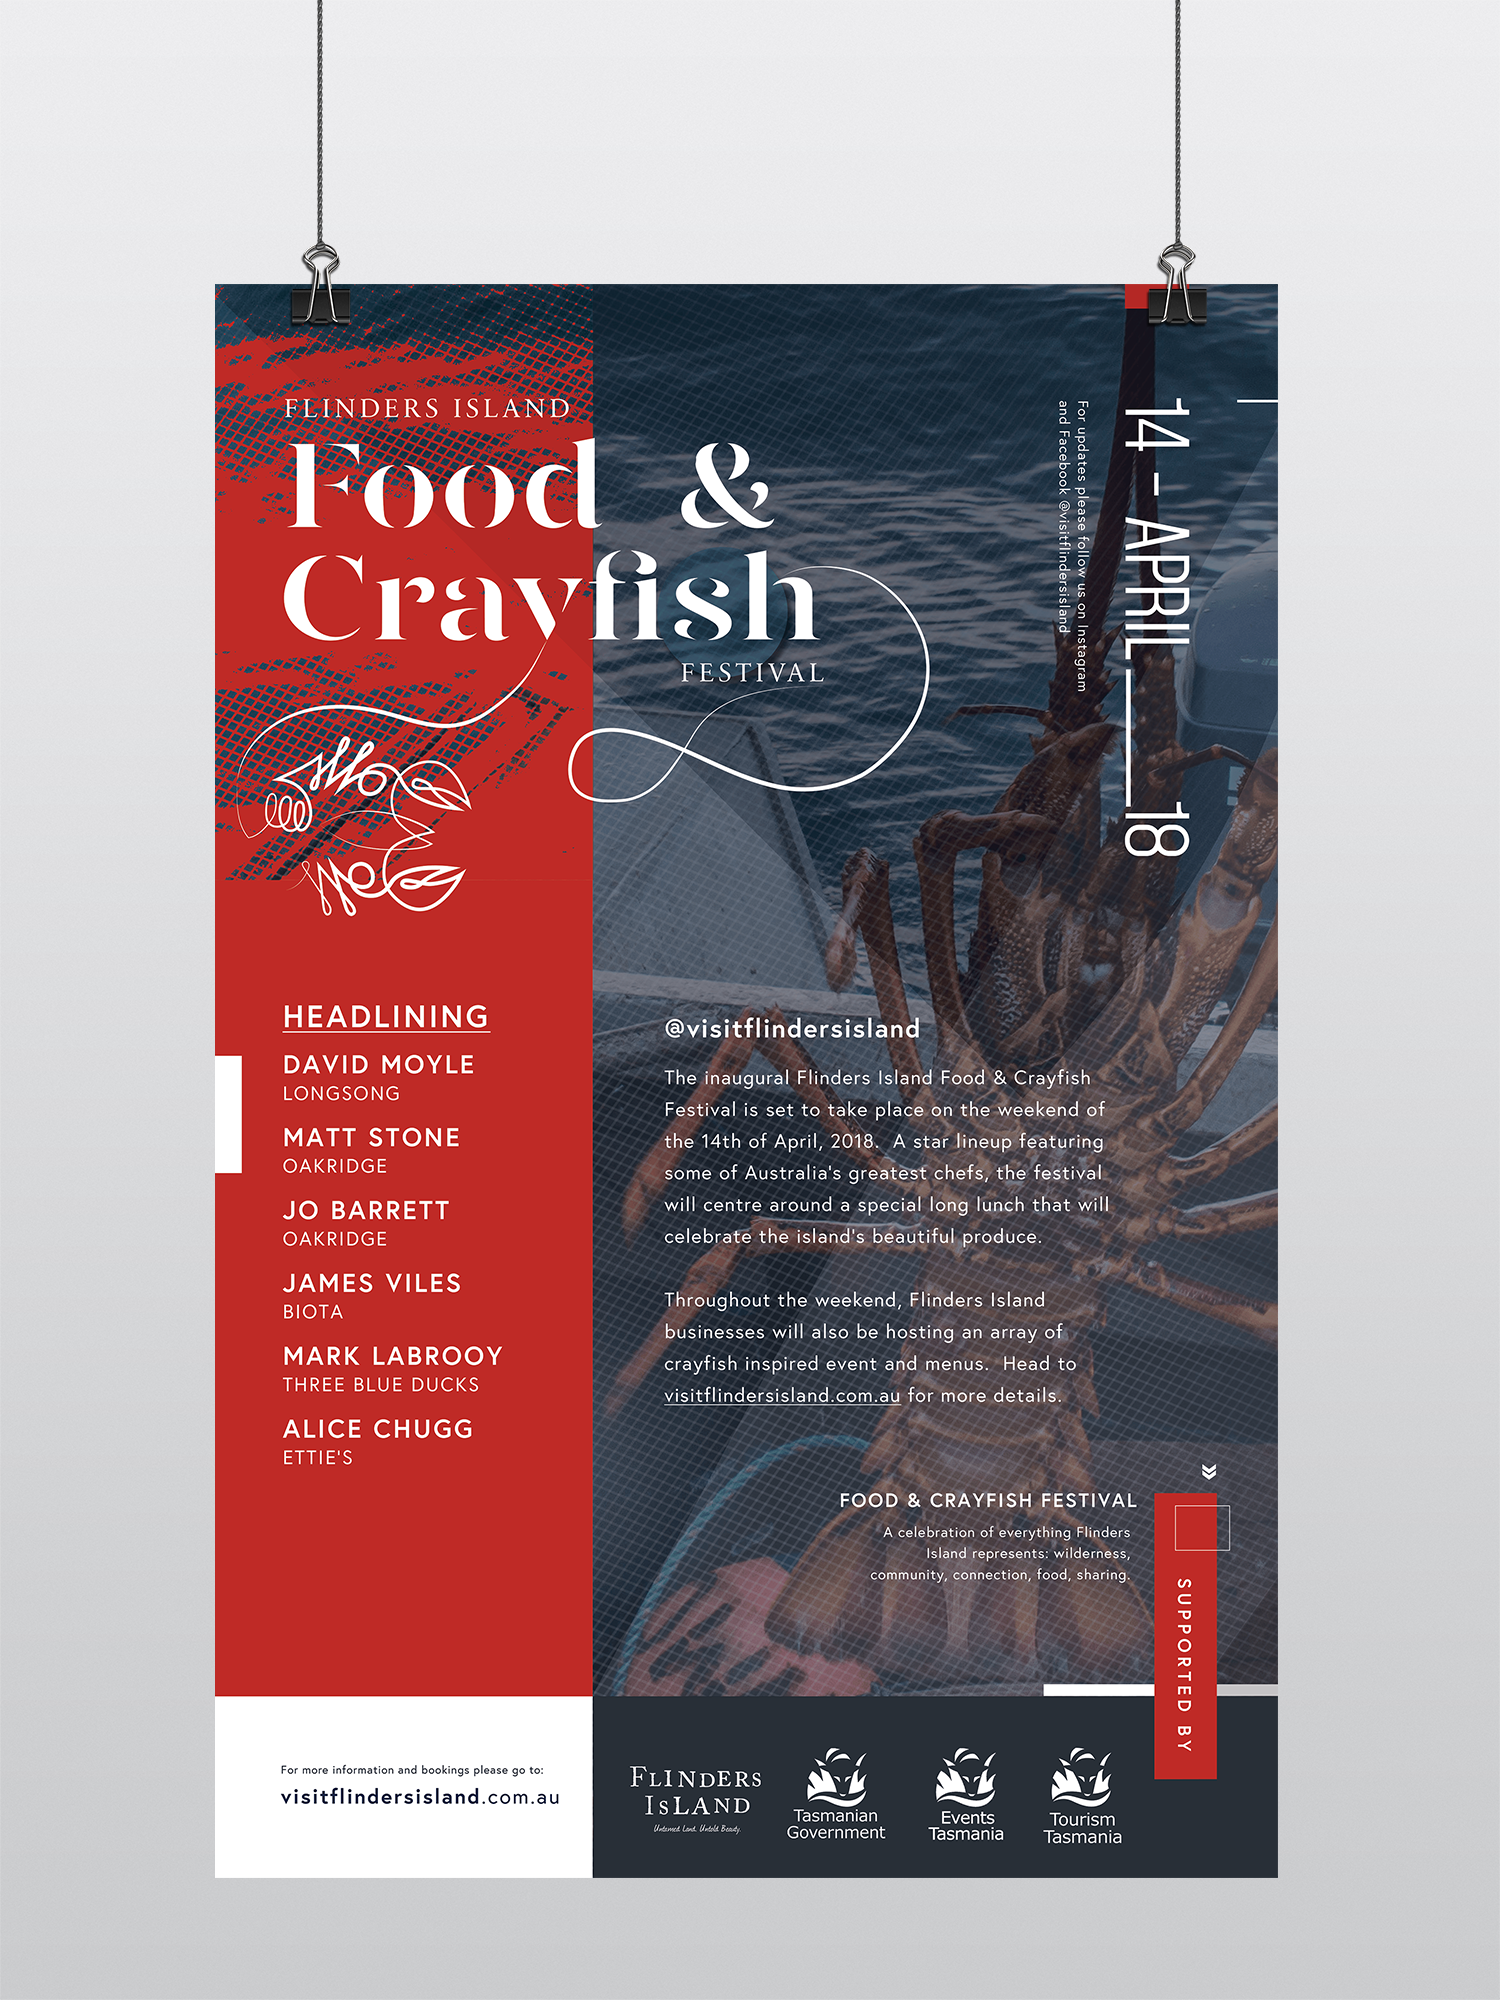 Flinders Island Food & Crayfish Festival 2018 Poster Design